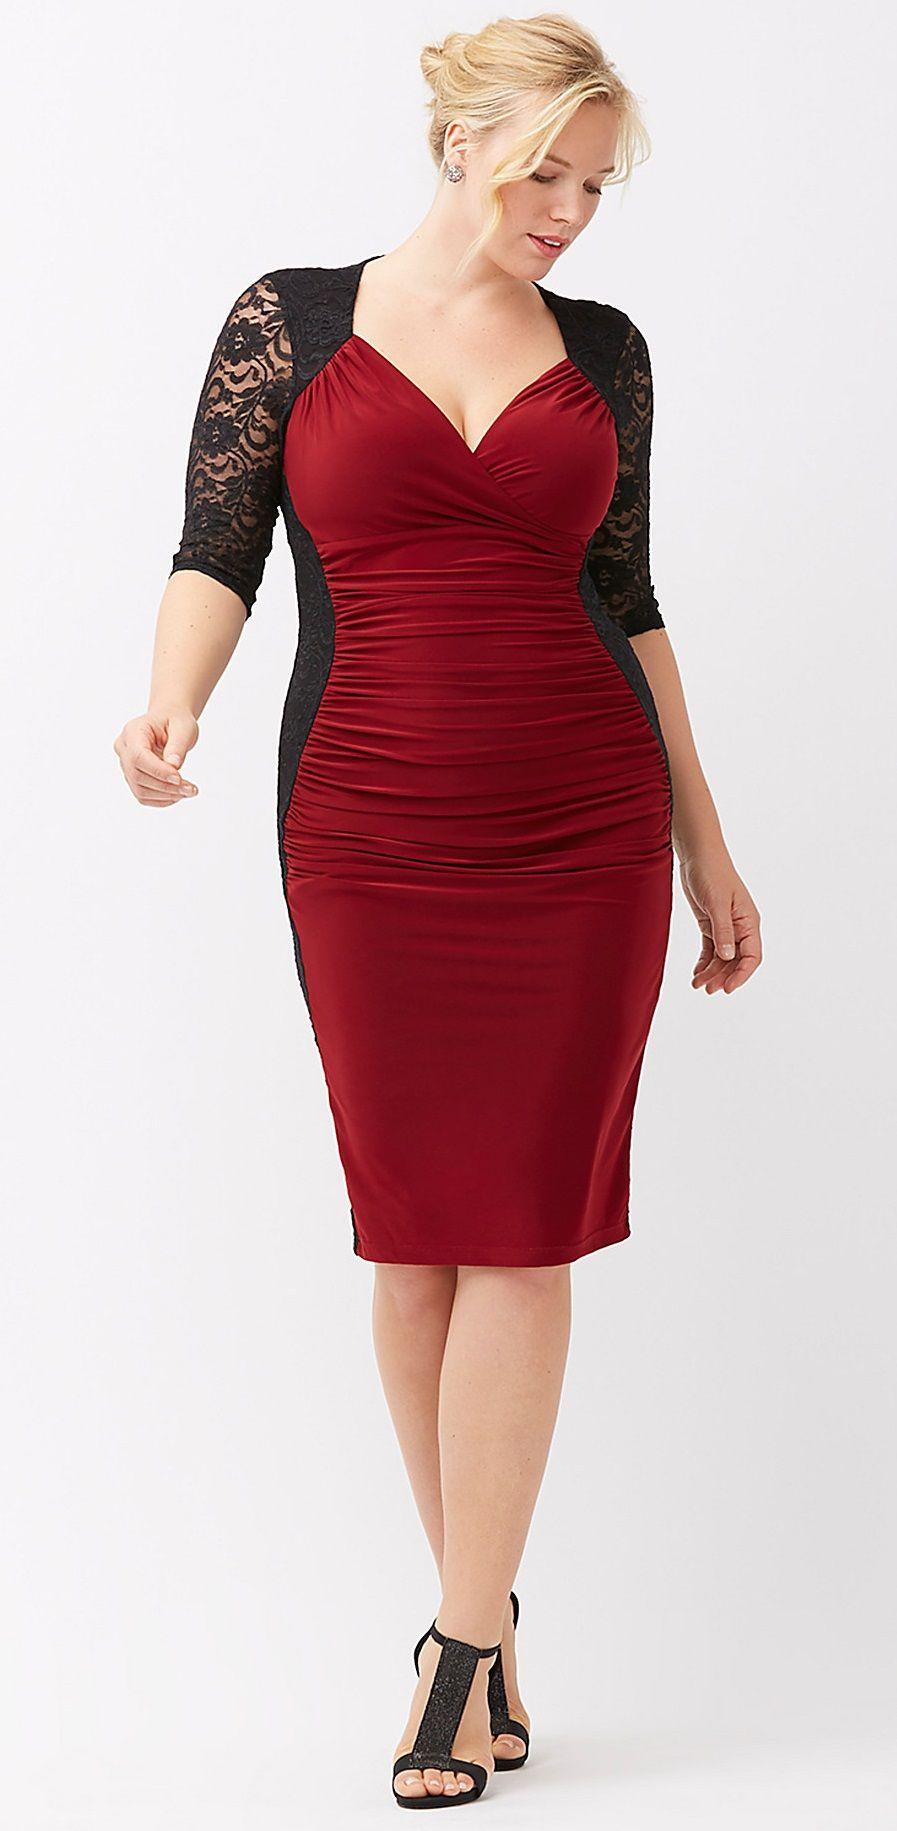 Plus Size Valentine\'s Day Date Dress - Plus Size Lace ...